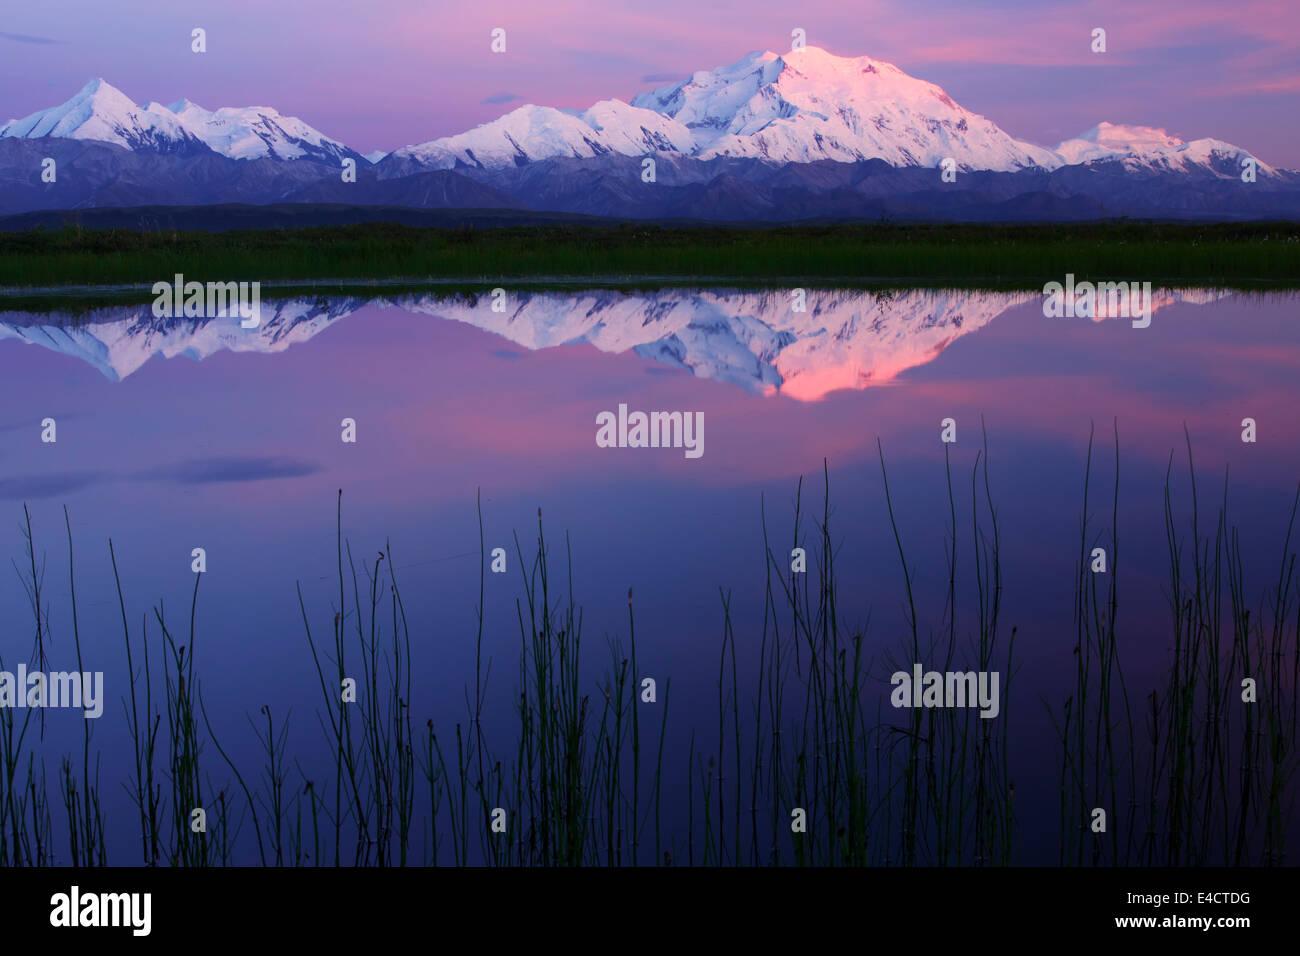 Mt. McKinley, also known as Denali, Denali National Park, Alaska.  - Stock Image